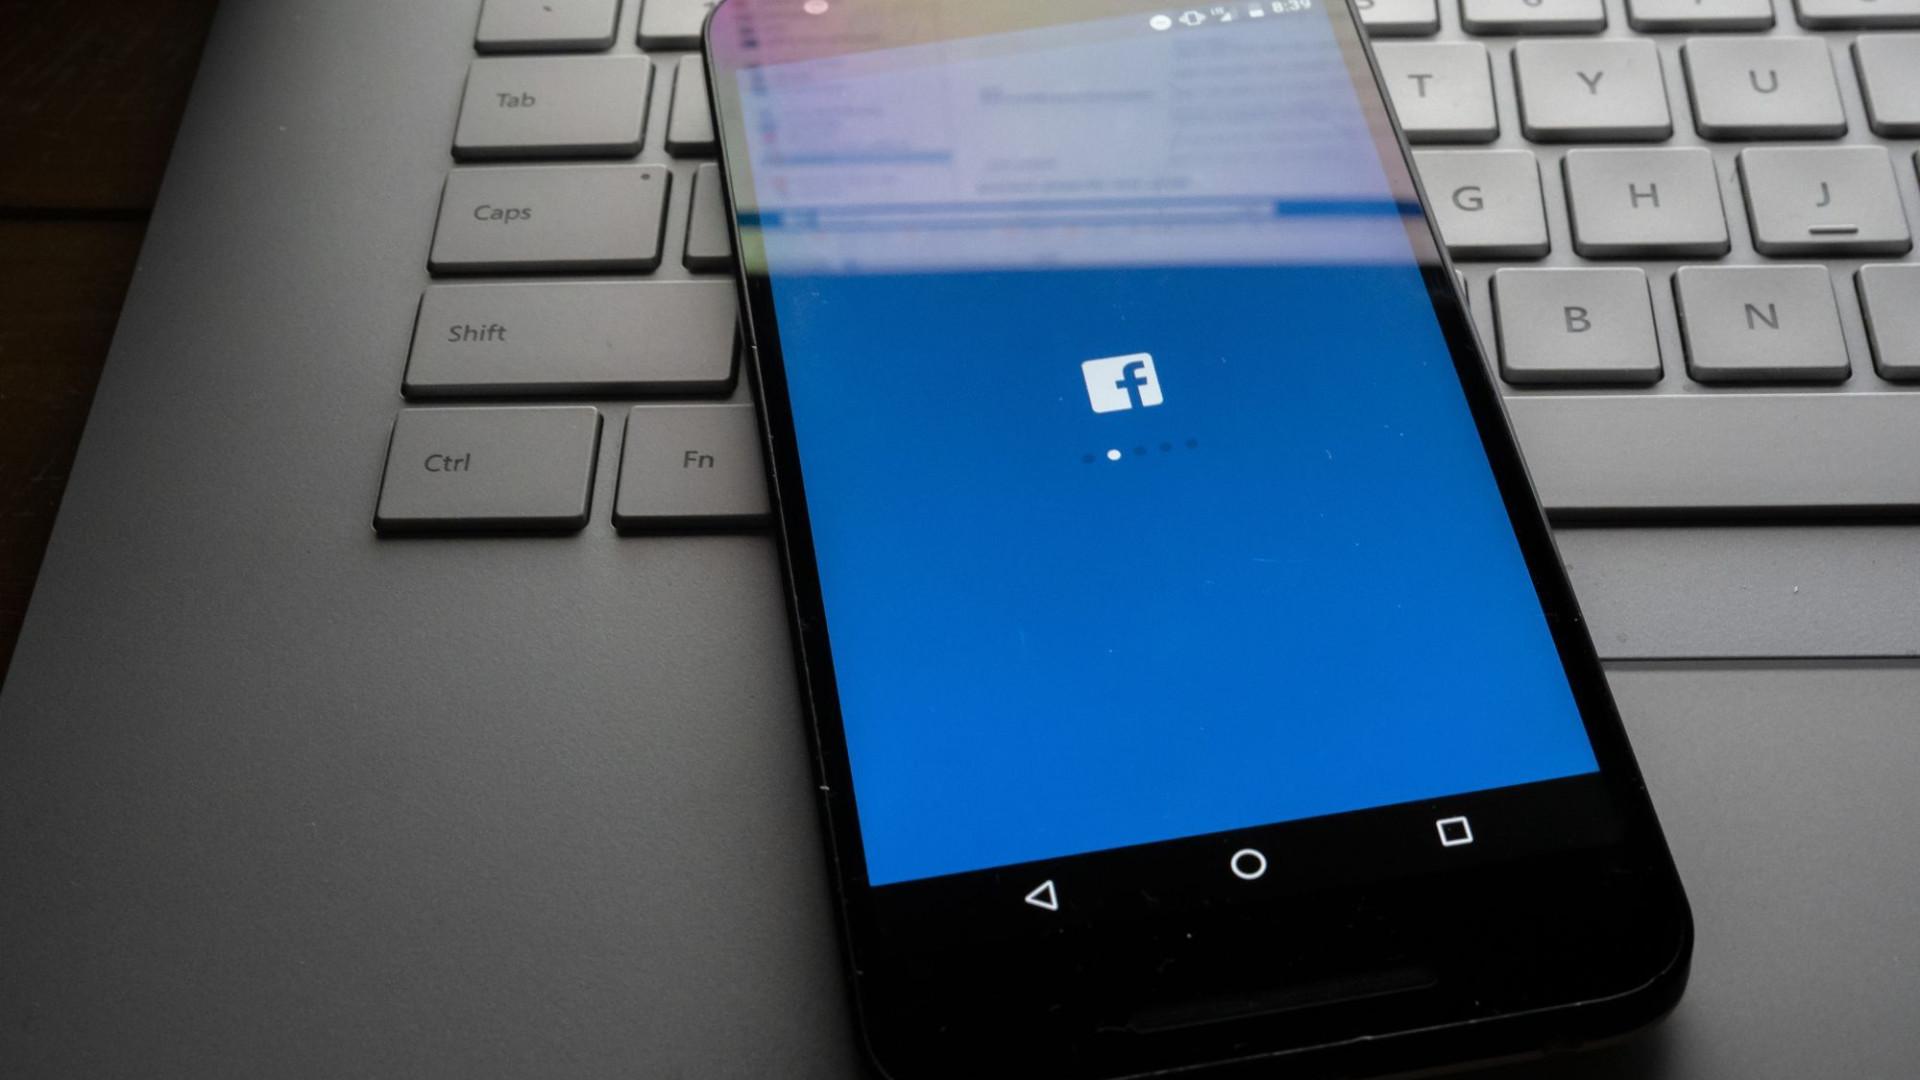 Receita publicitária do Facebook cresce 22% apesar de boicote de anunciantes